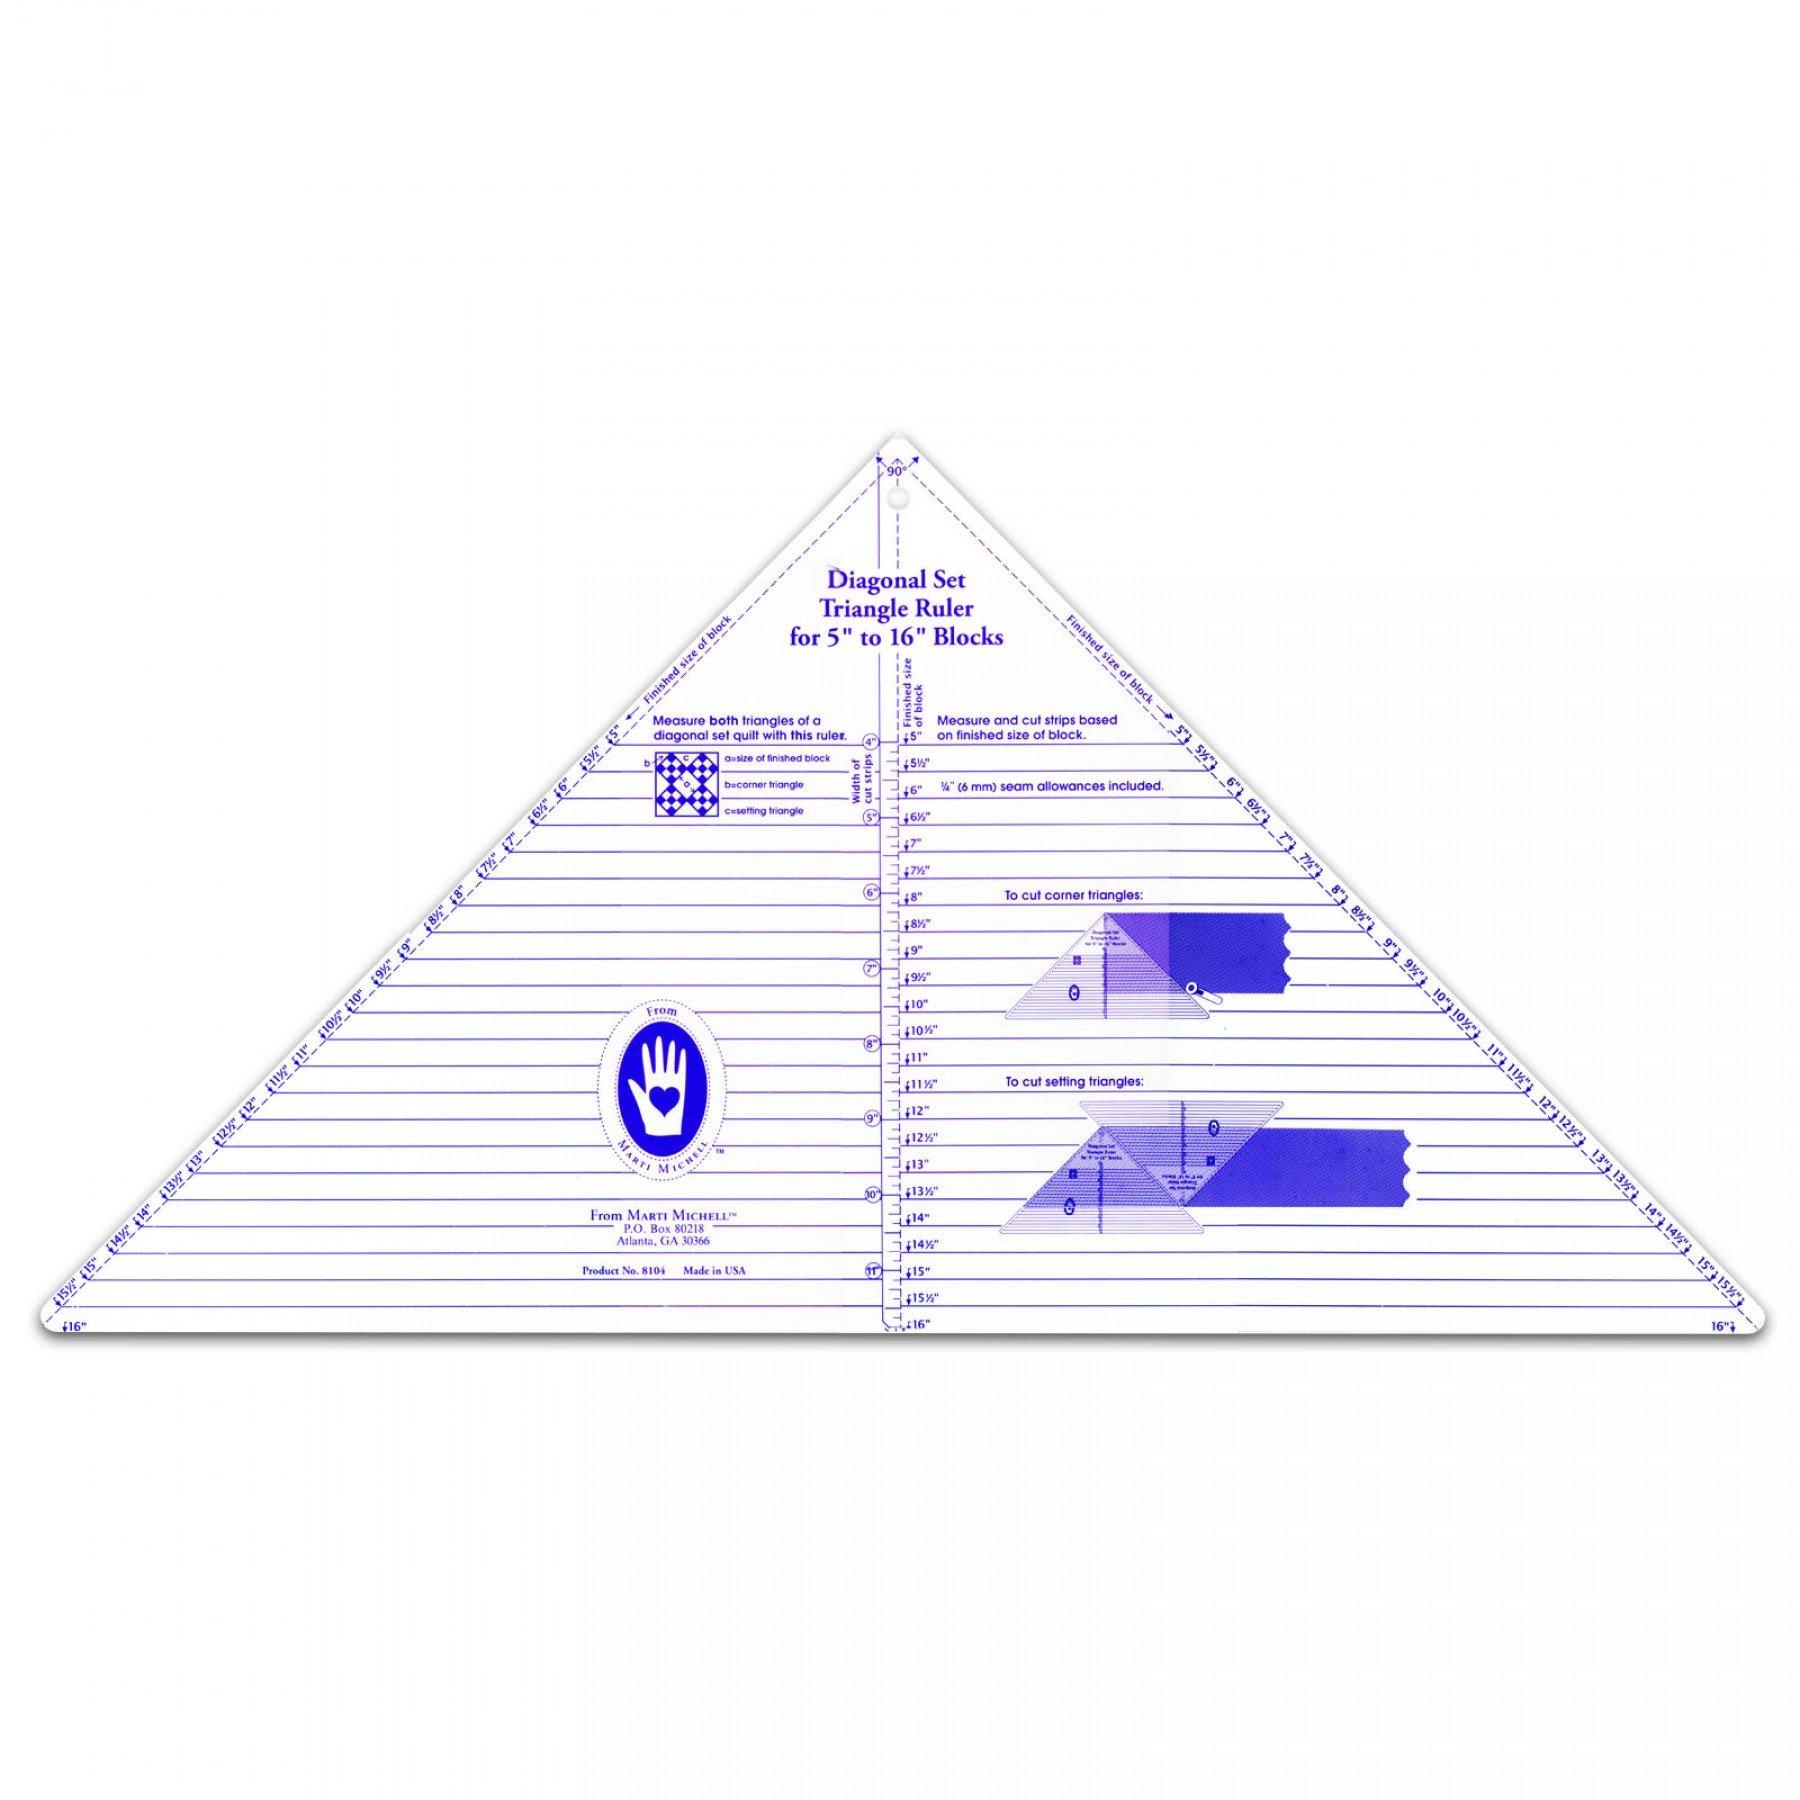 Diagonal Set Triangle Ruler | EE Schenck Co